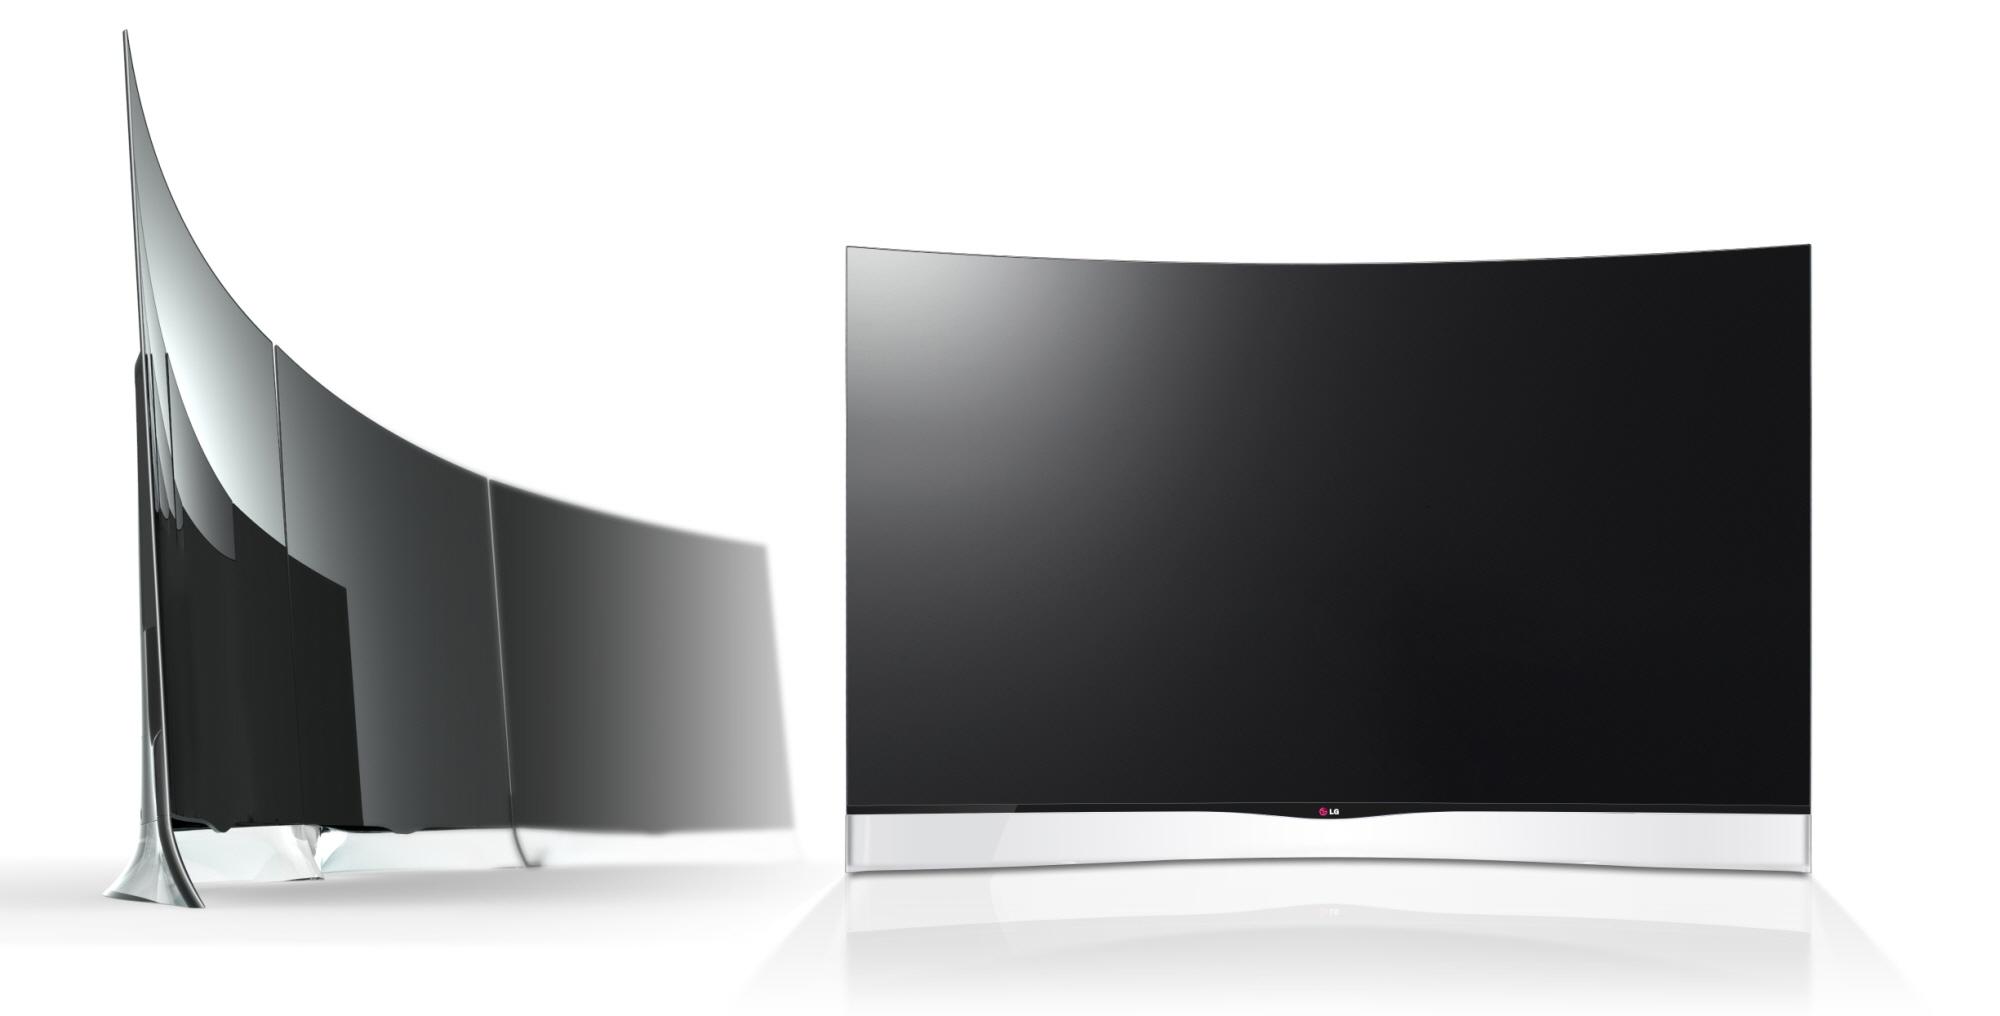 Телевизоры lg новинки 2016 года и цены - c1f9f